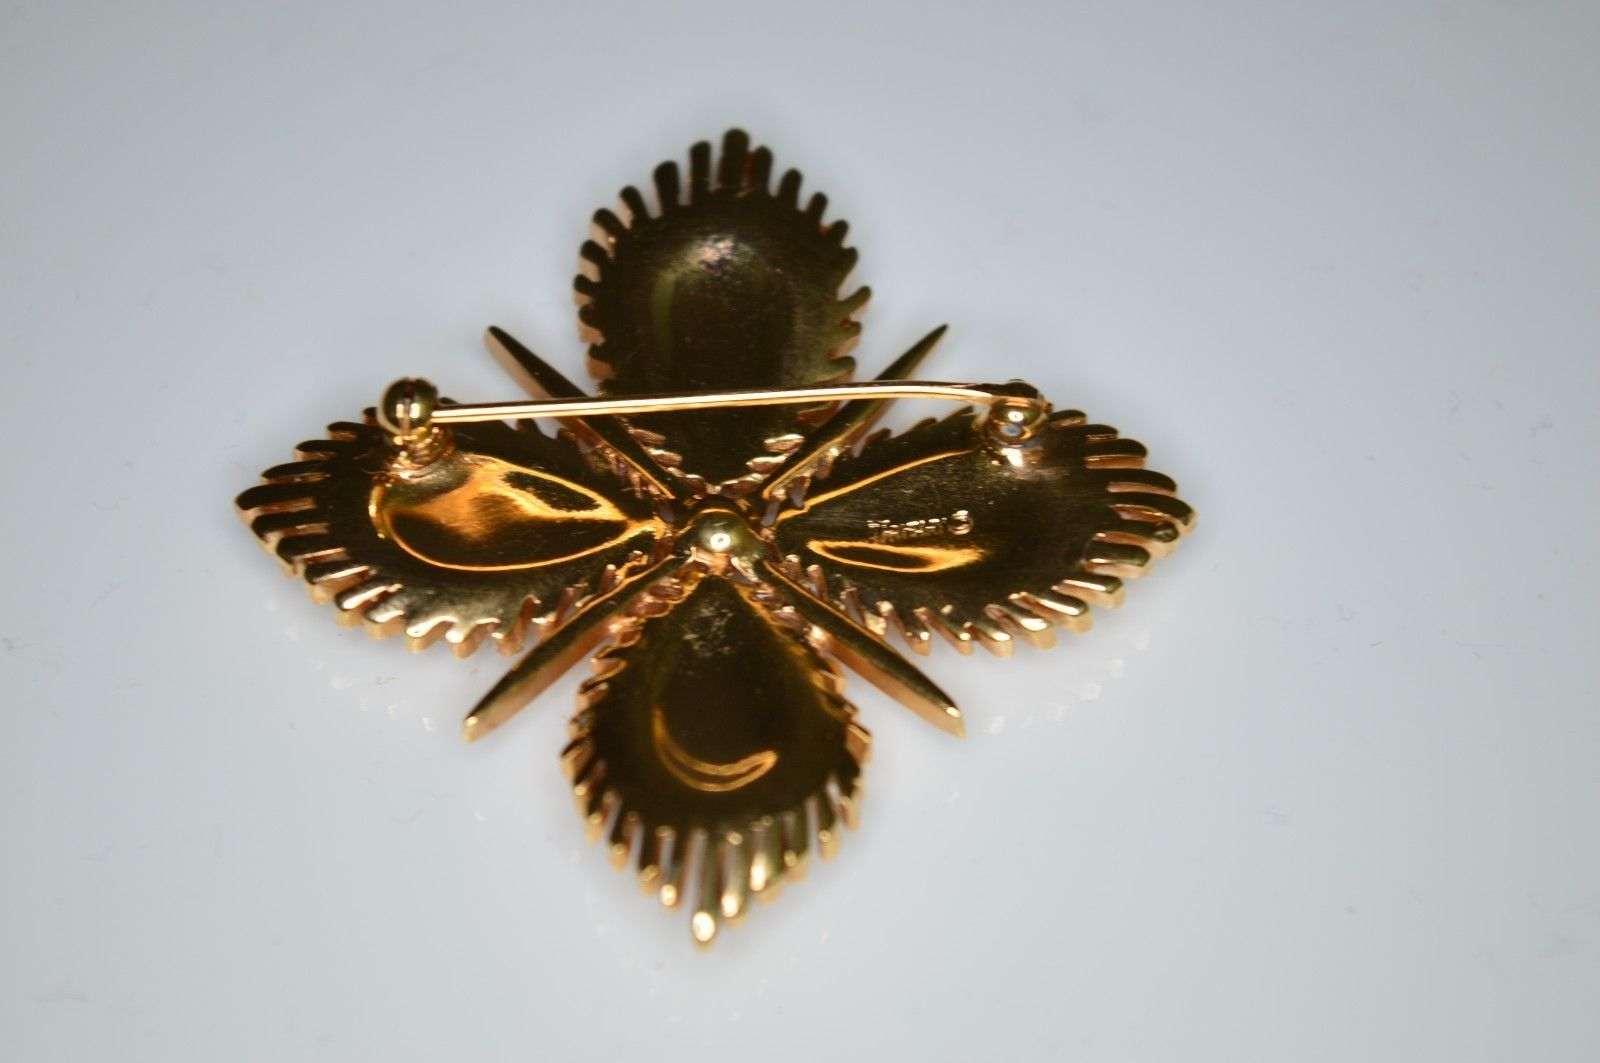 VTG RARE 50's CROWN TRIFARI Clear Rhinestone Maltese Cross Pin Brooch